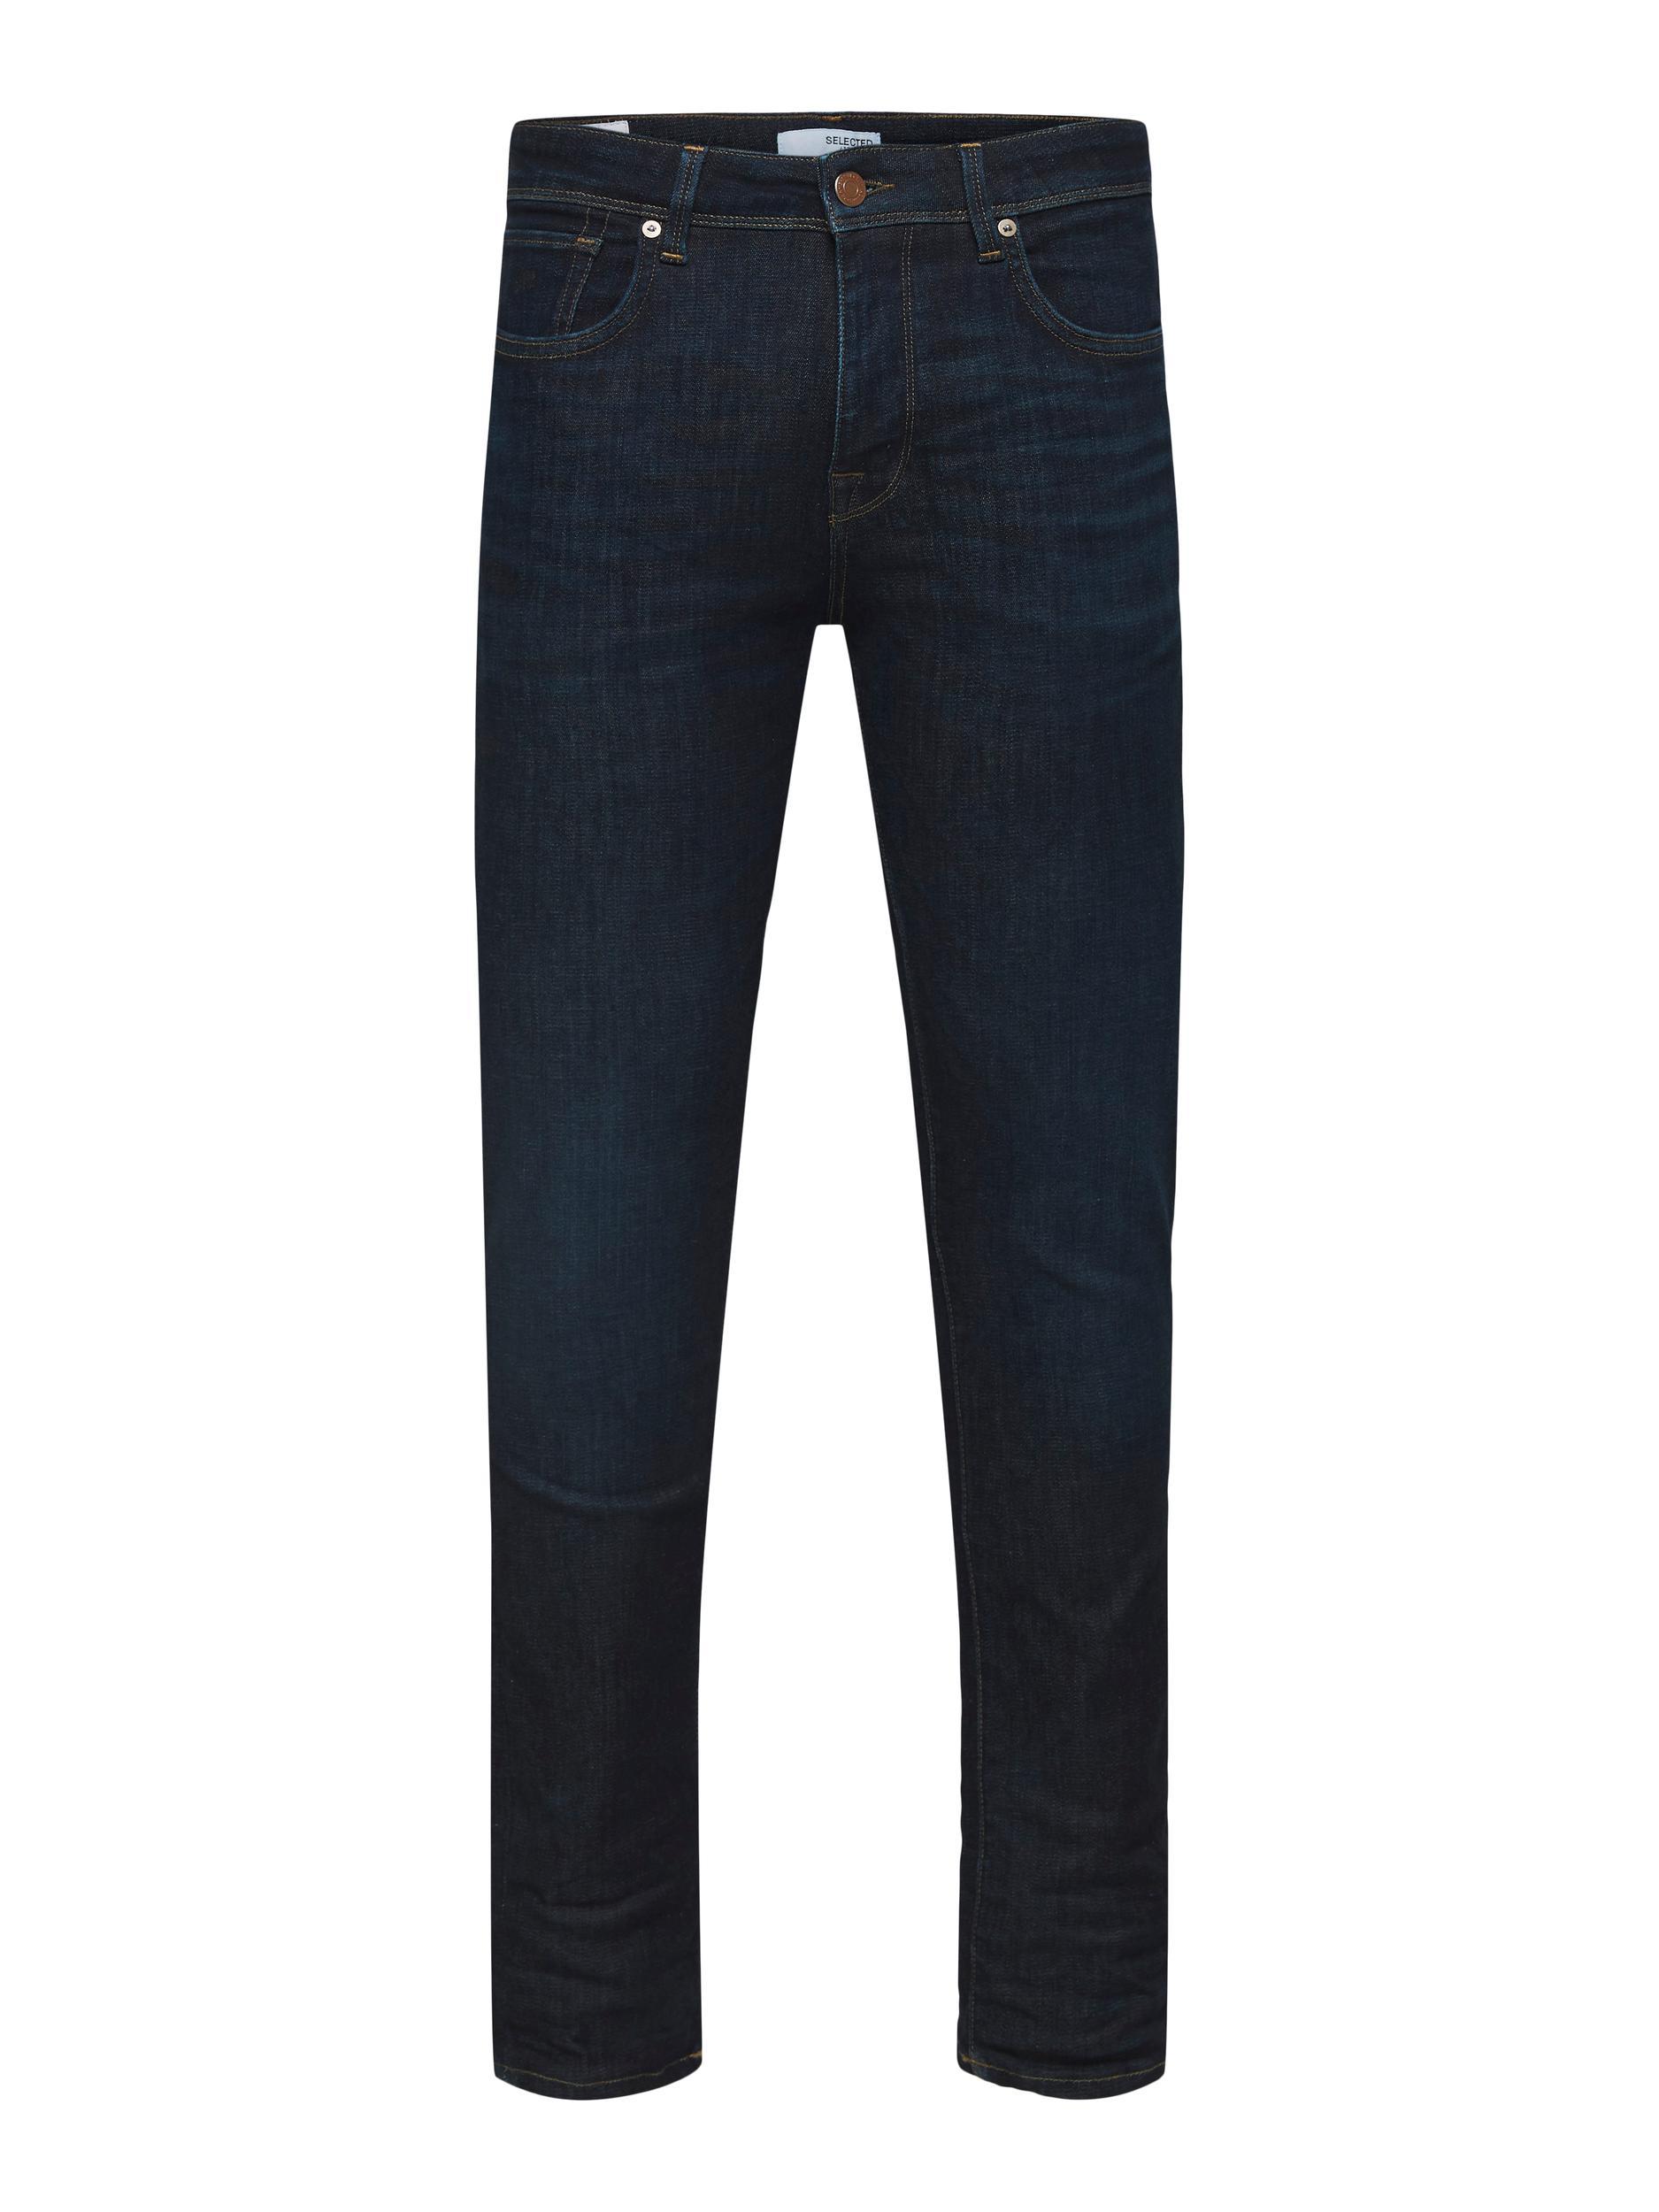 Selected Slim-Leon Jeans, Dark Blue Denim, 38/32